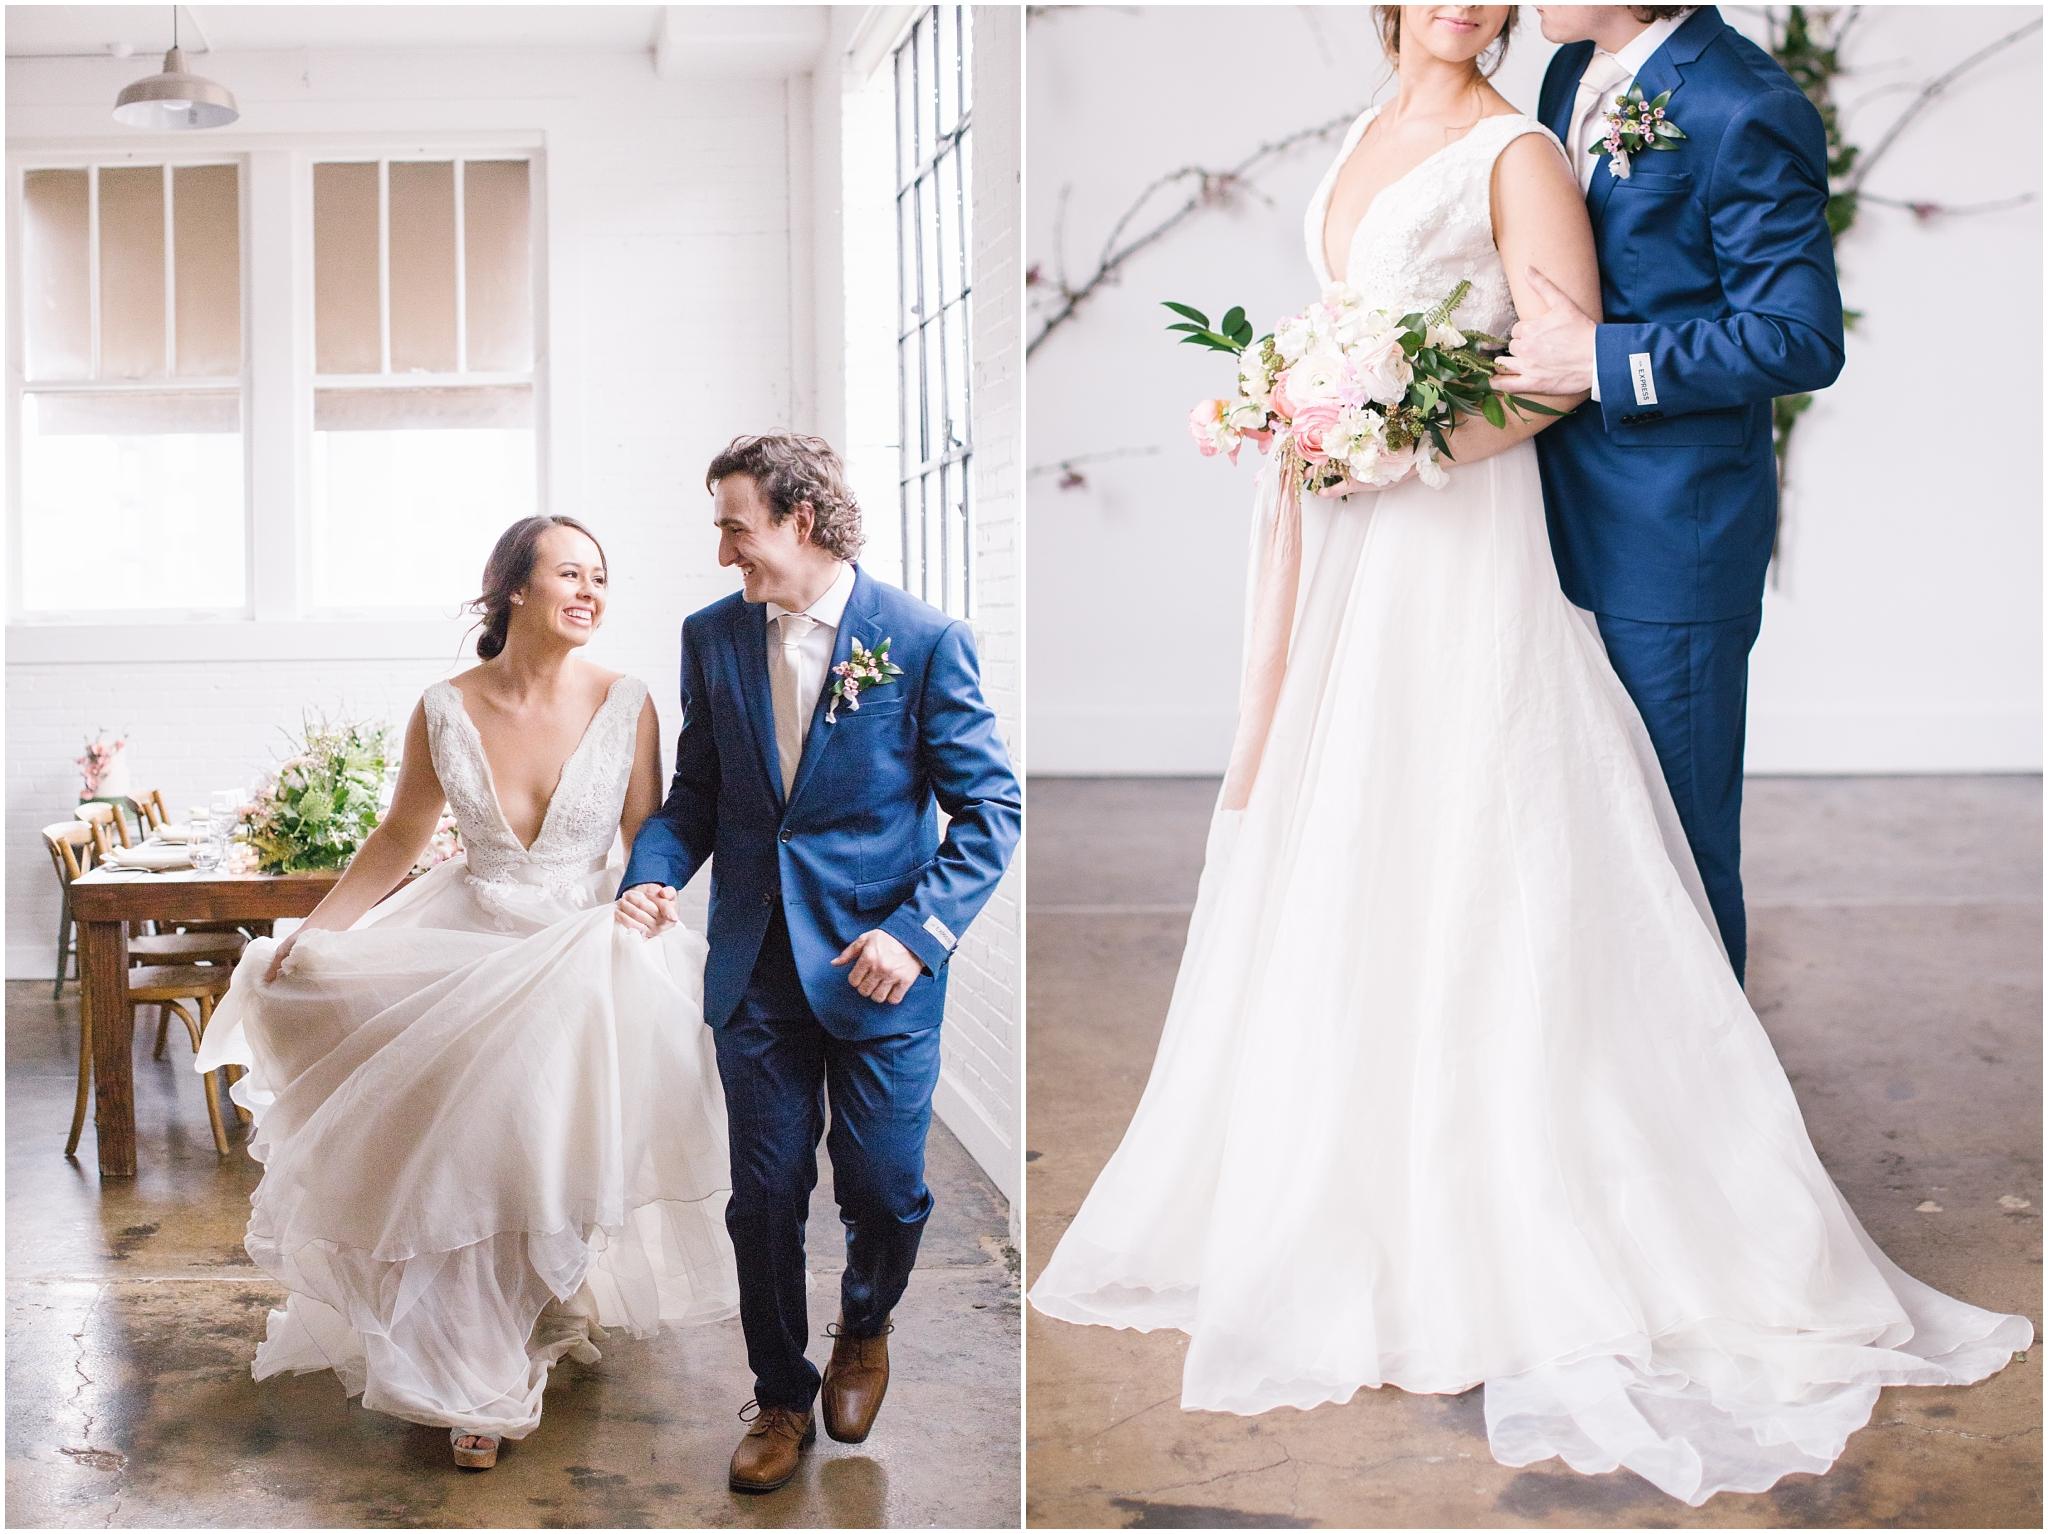 Lizzie-B-Imagery-Utah-Wedding-Photographer-Salt-Lake-City-Park-City-Utah-County_0022.jpg